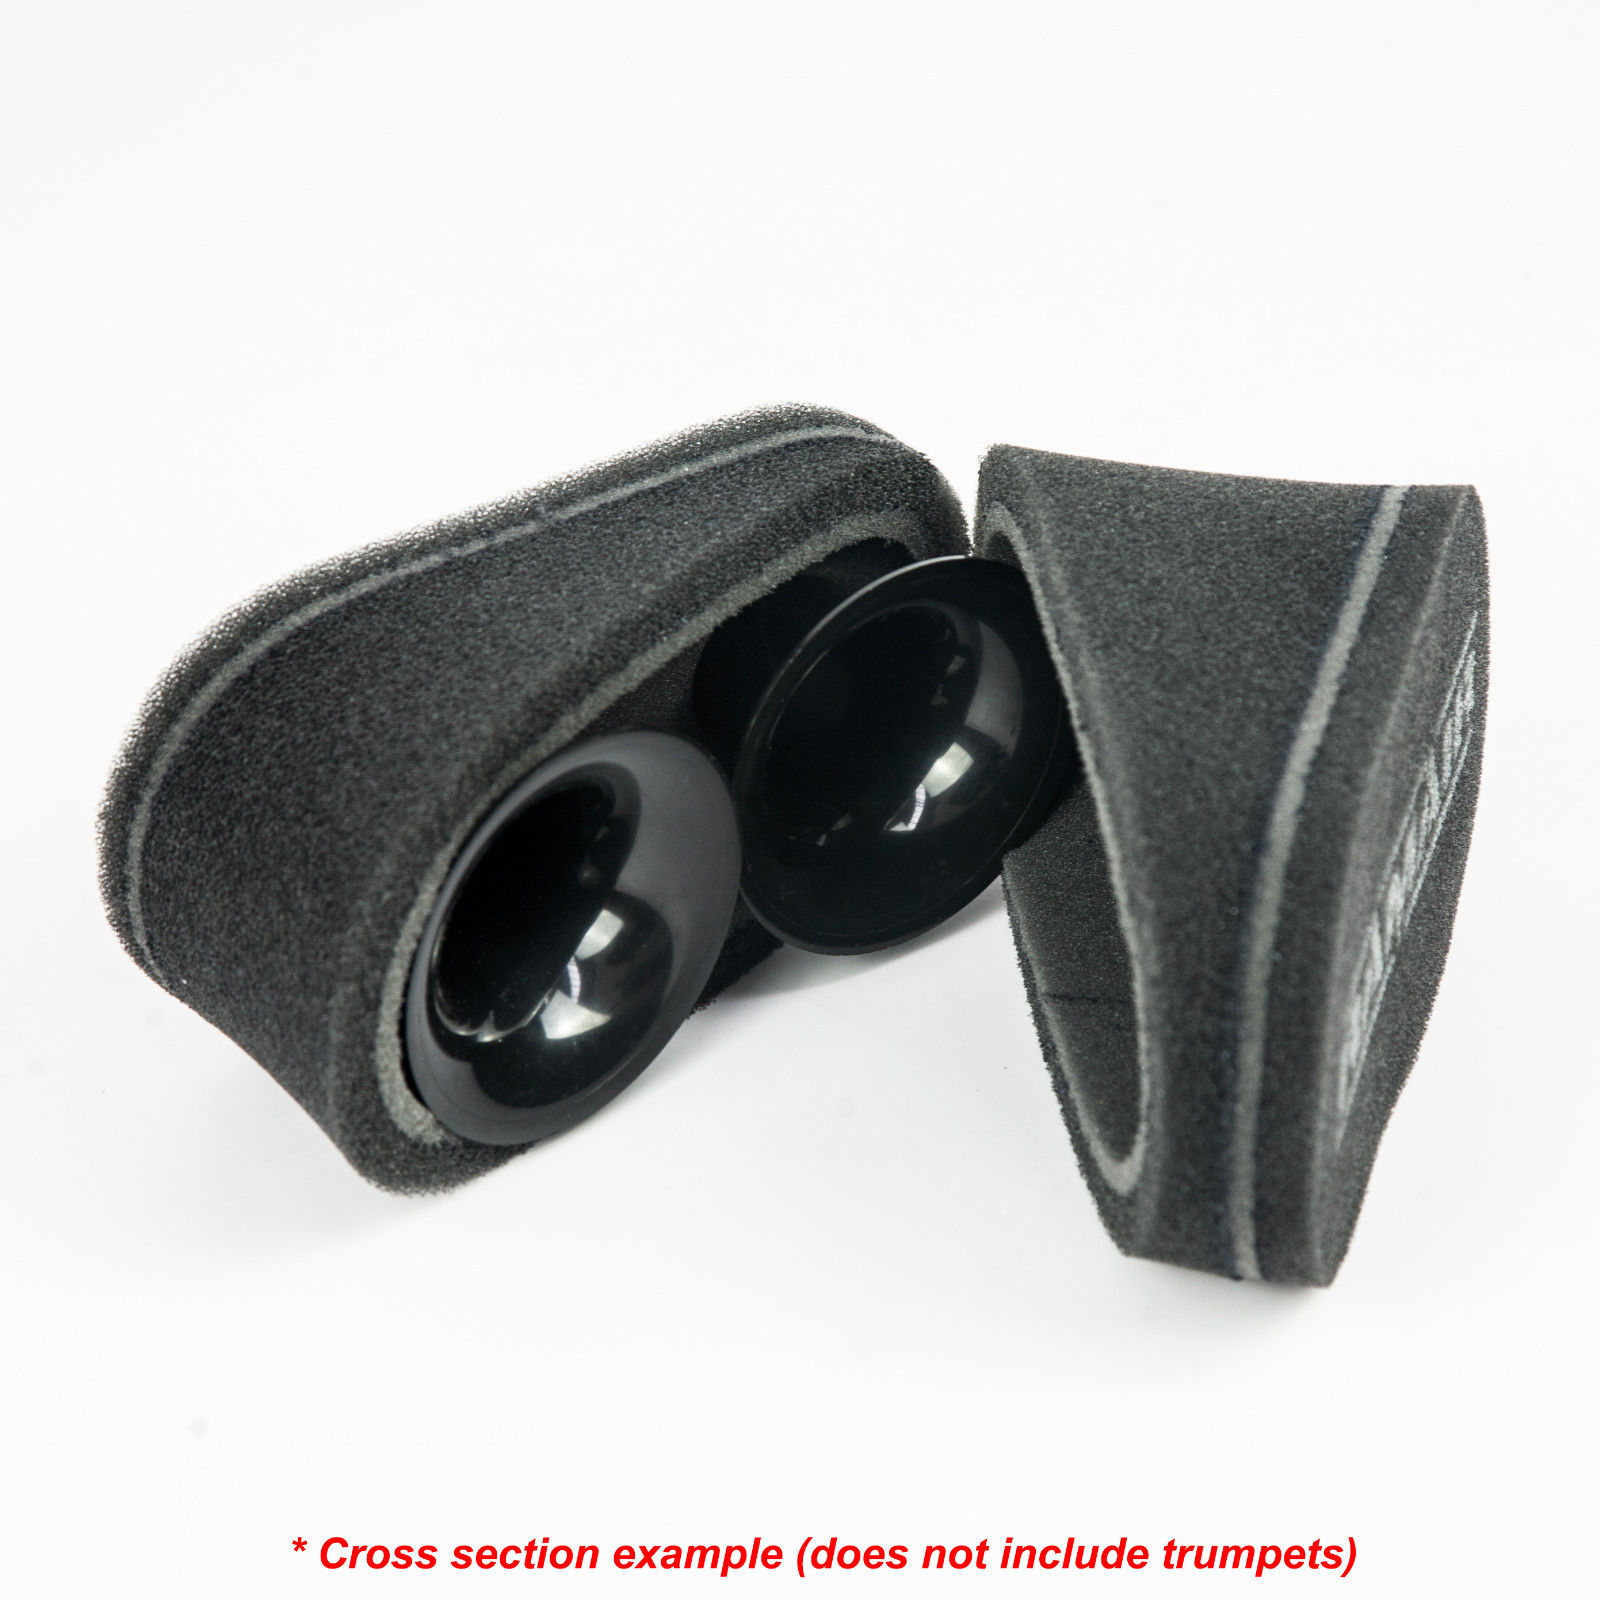 3 X Ramair Carb Sock Air Filters Datsun 240z 260z 280z Rph Weber 45 Fuel Filter Dcoe